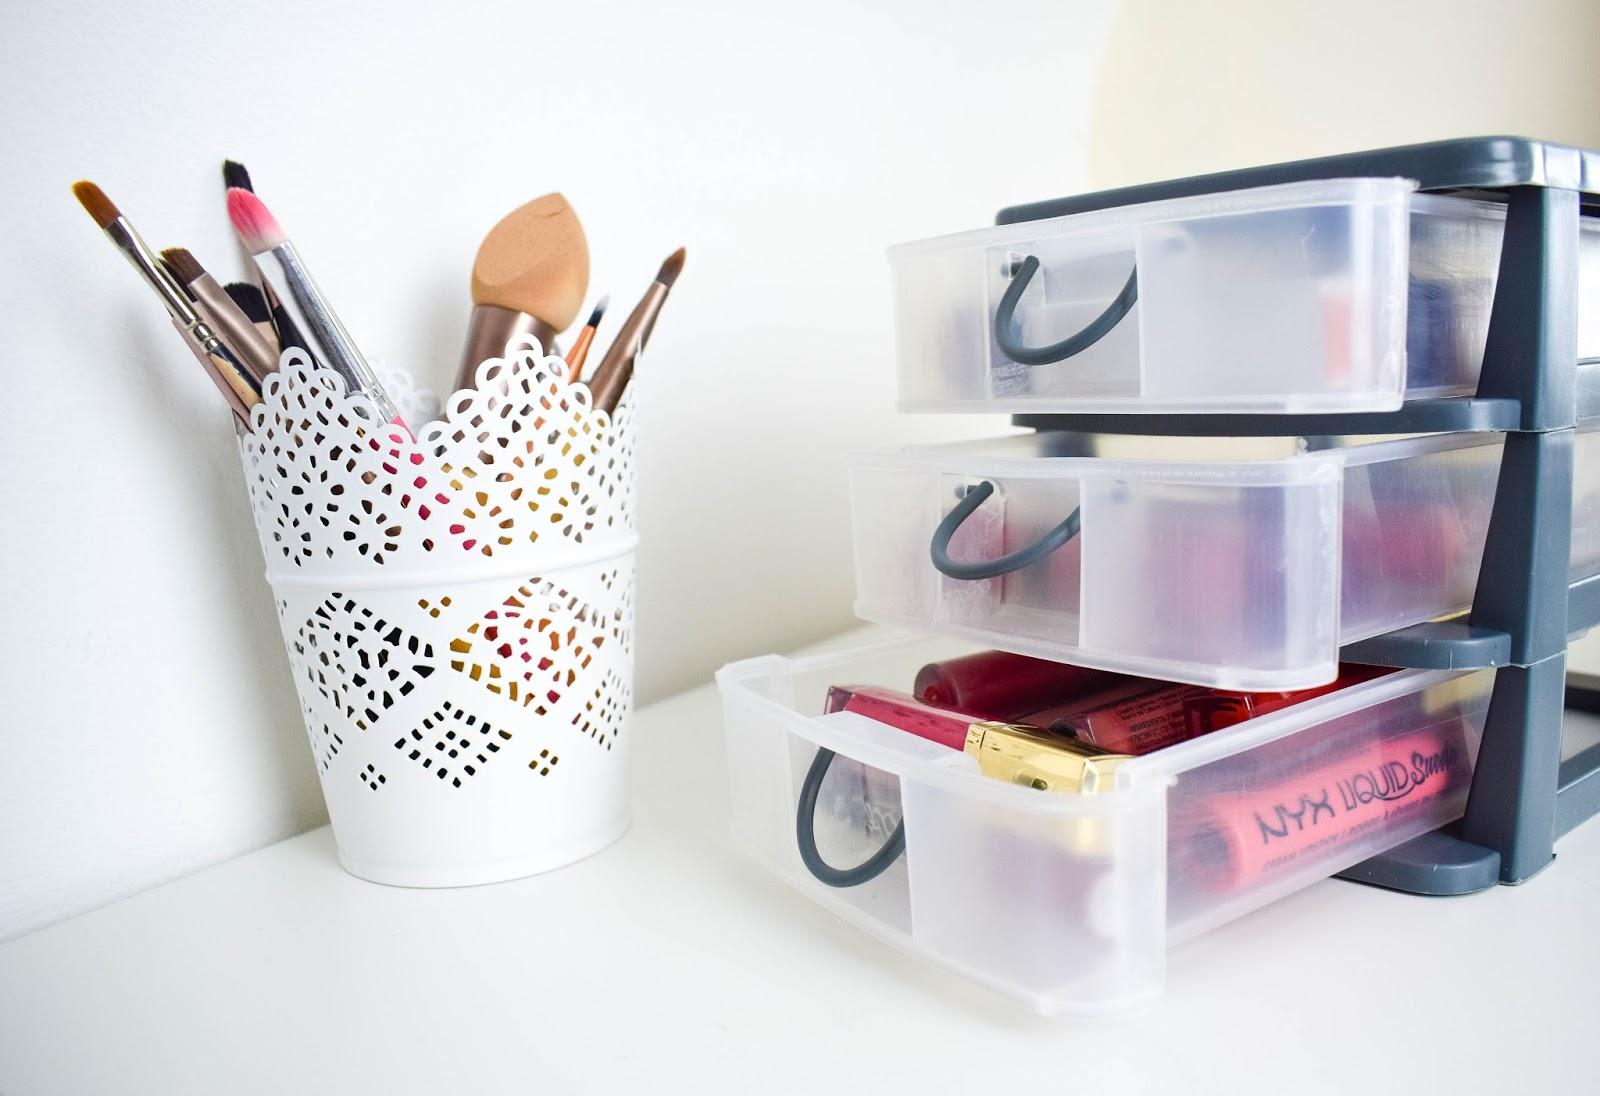 lebellelavie - The £1 lipstick storage you need